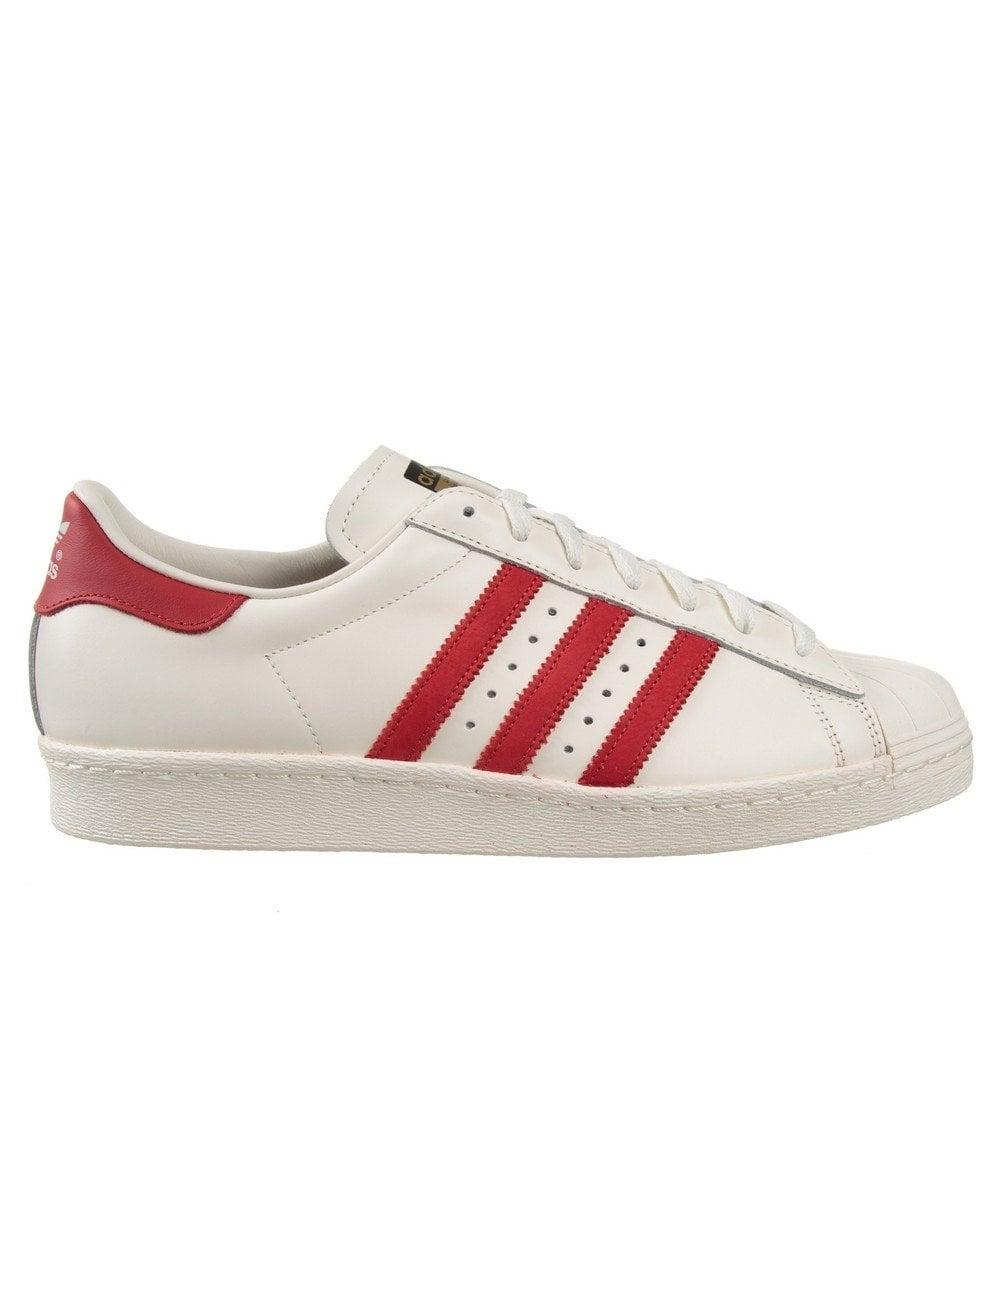 adidas superstar 80s red